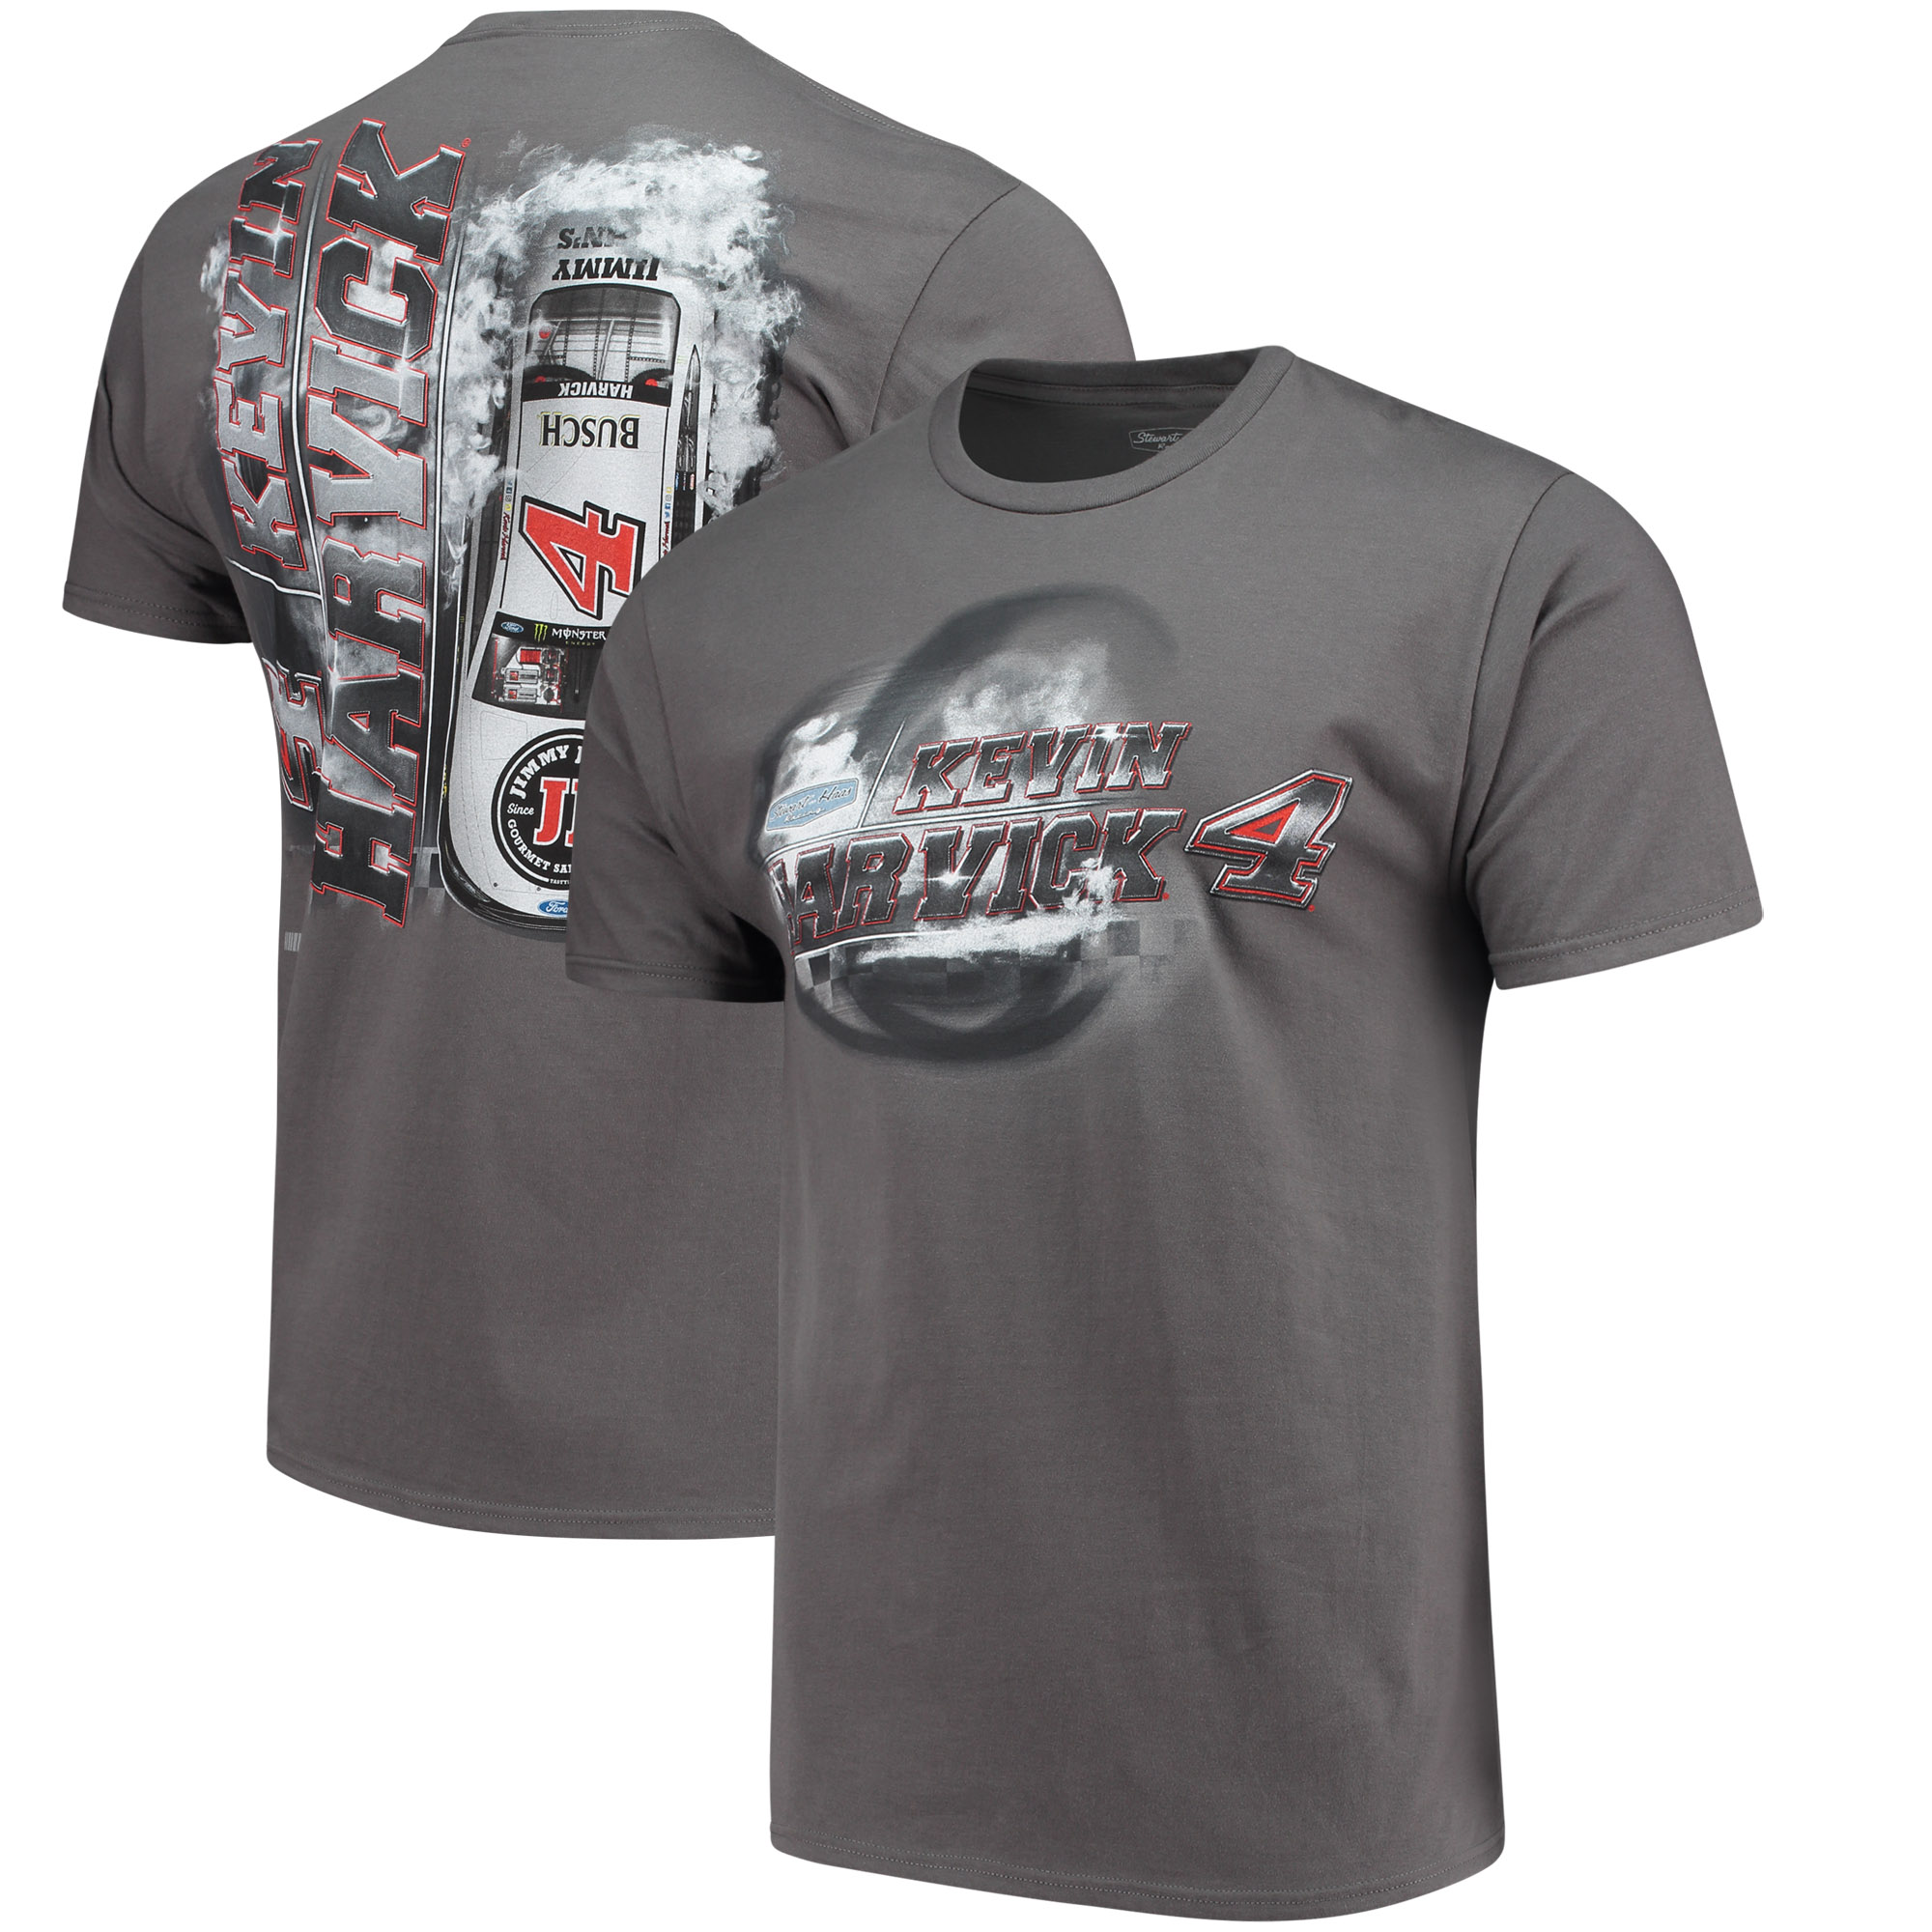 Kevin Harvick Steel Thunder Logo T-Shirt - Charcoal